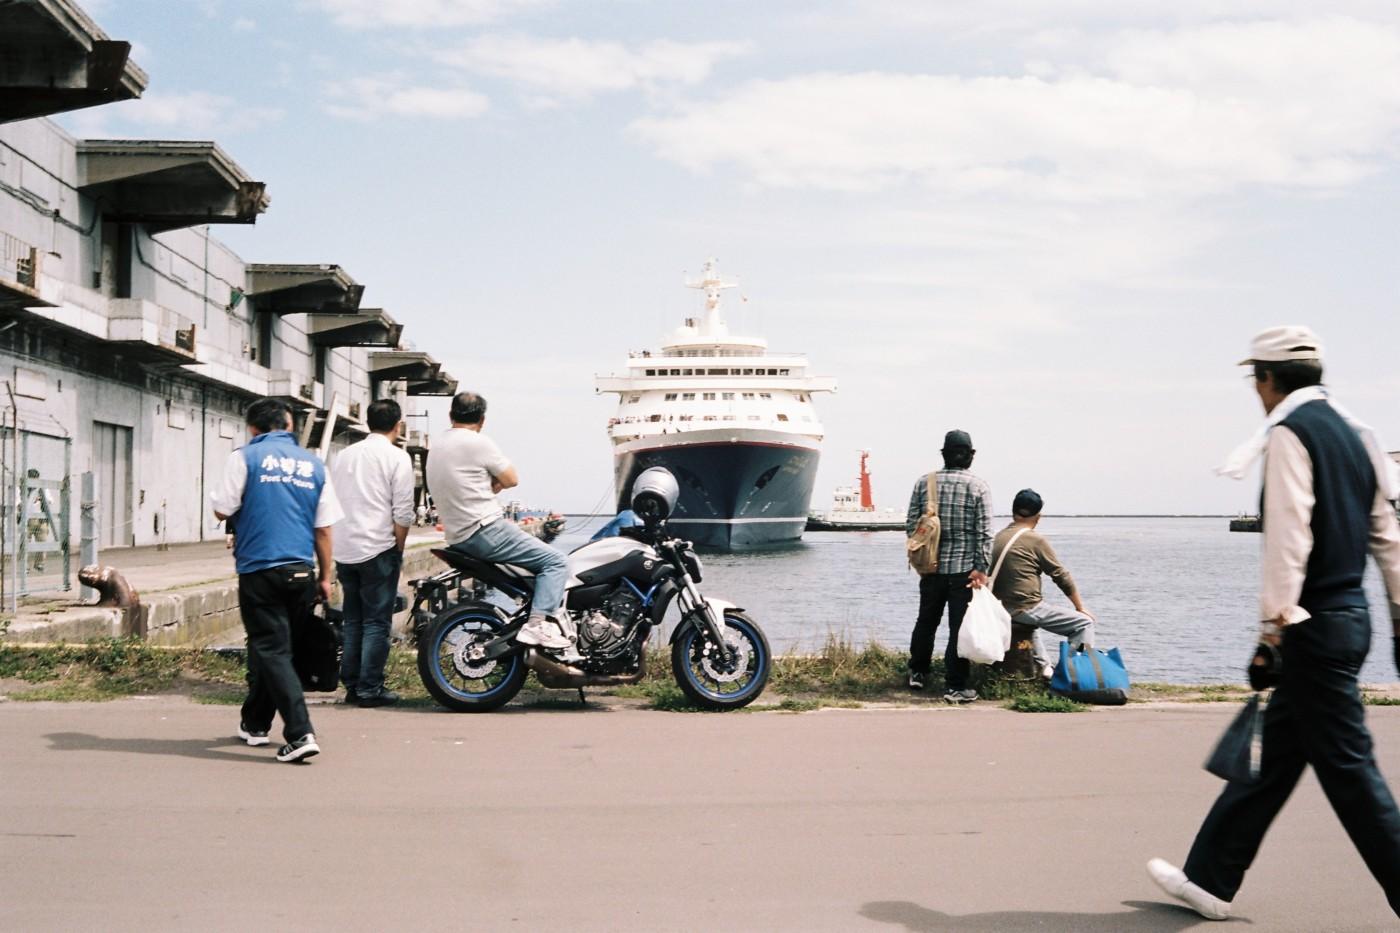 Otaru port - Kodak Portra 160 05